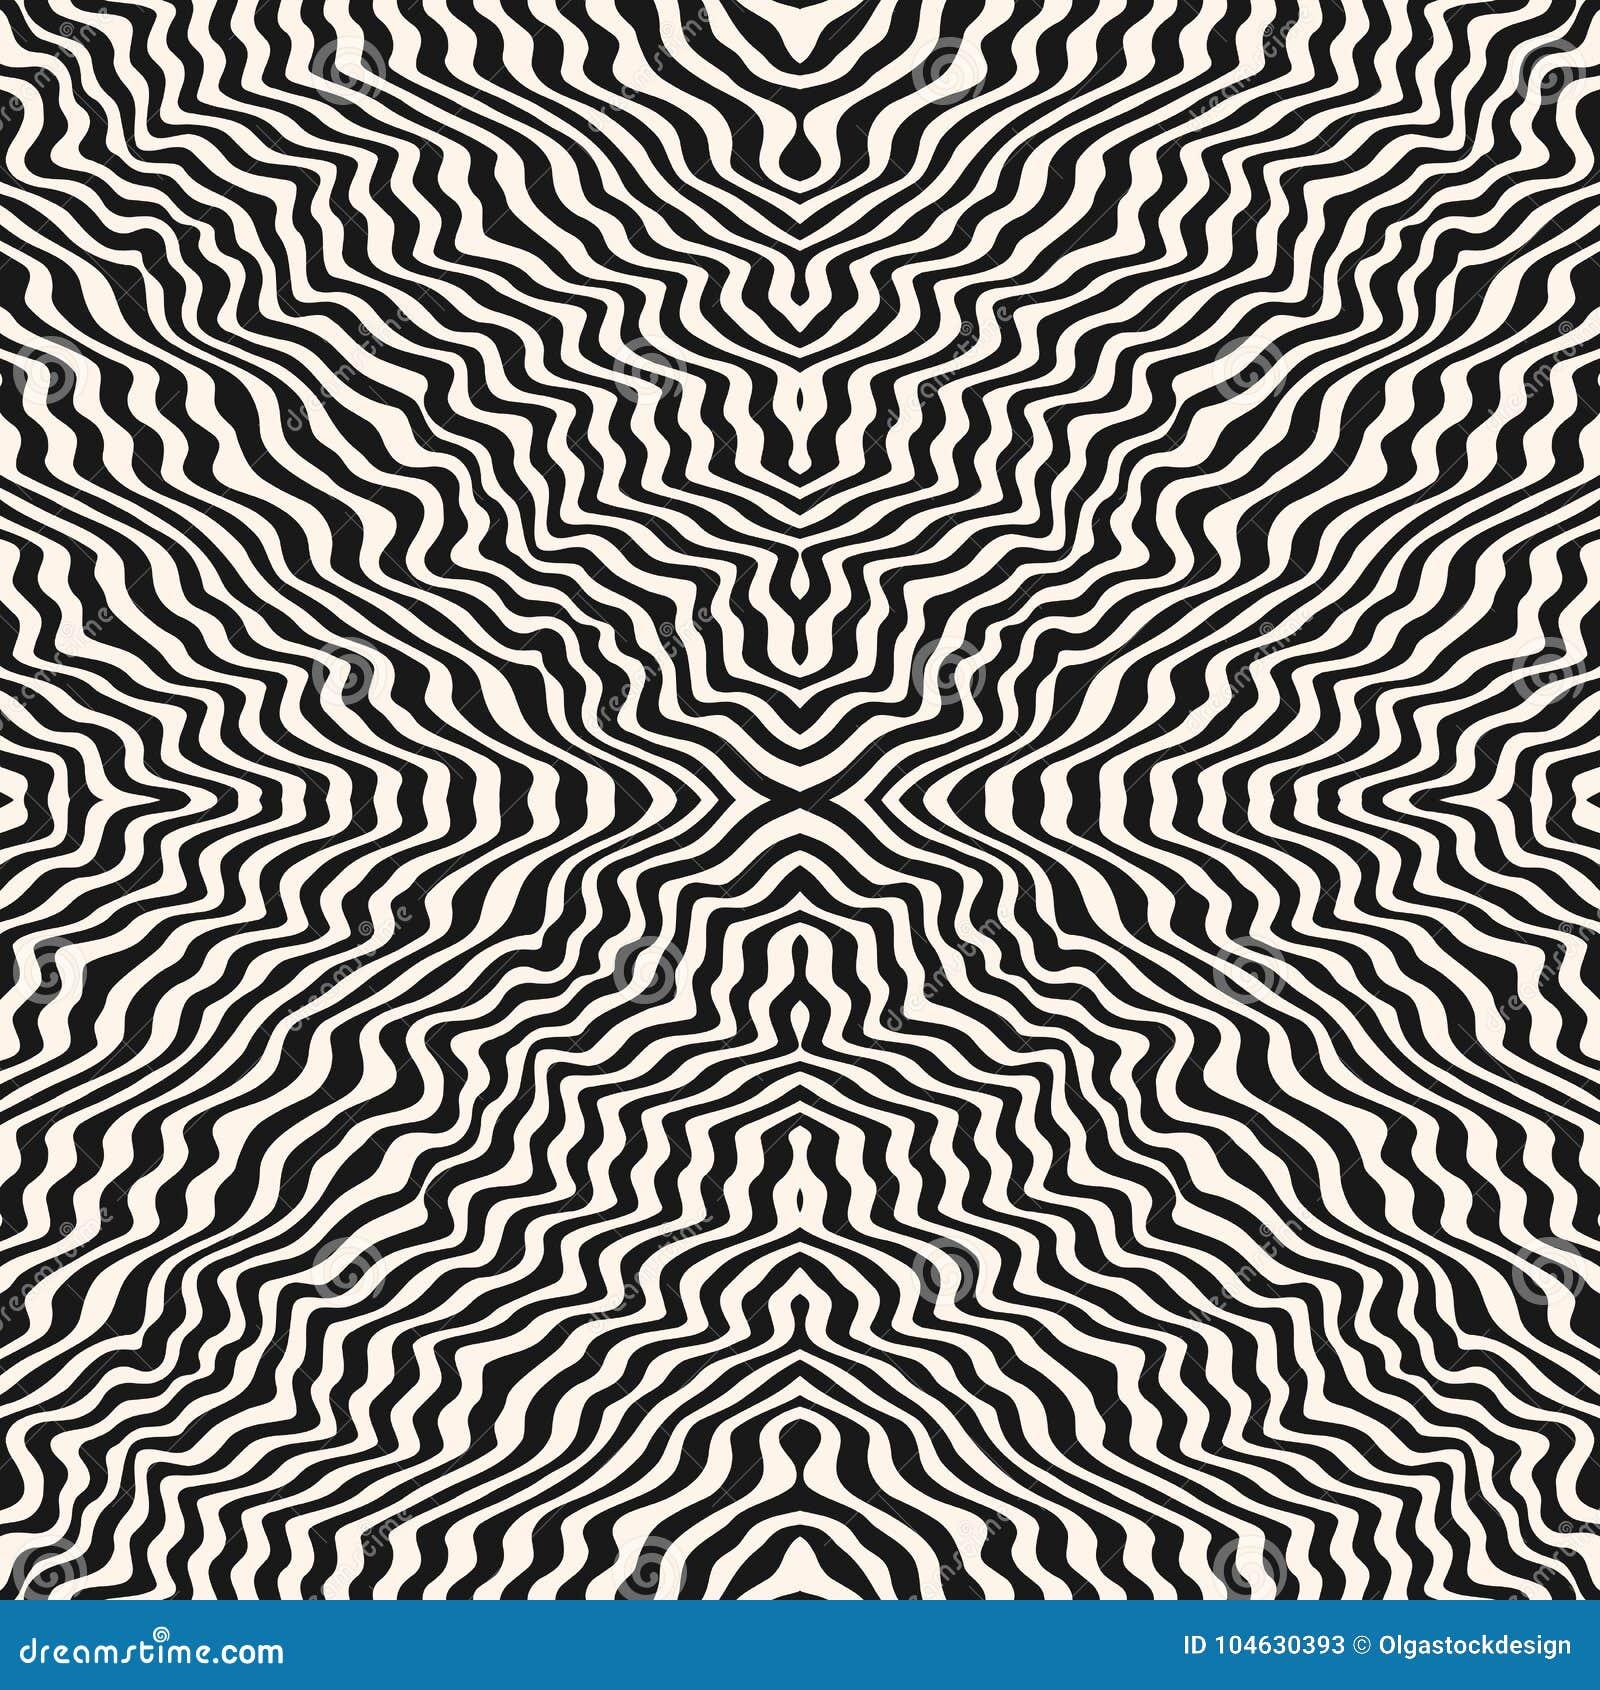 Image of: Images Animal Print Zebra Skin Dreamstimecom 3d Seamless Pattern Animal Print Zebra Skin Stock Vector